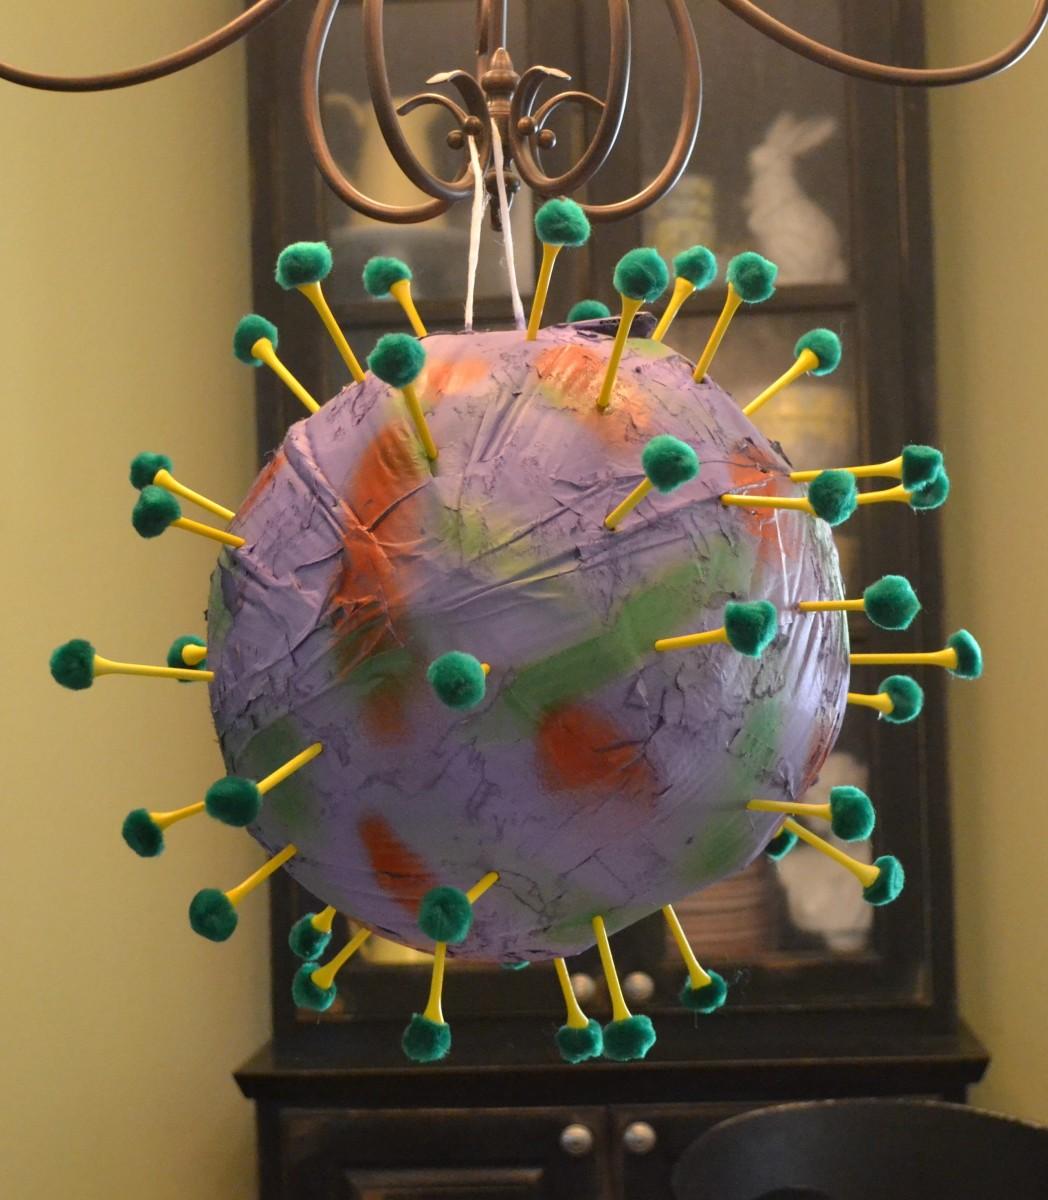 How to Make a Coronavirus Pandemic Pinata